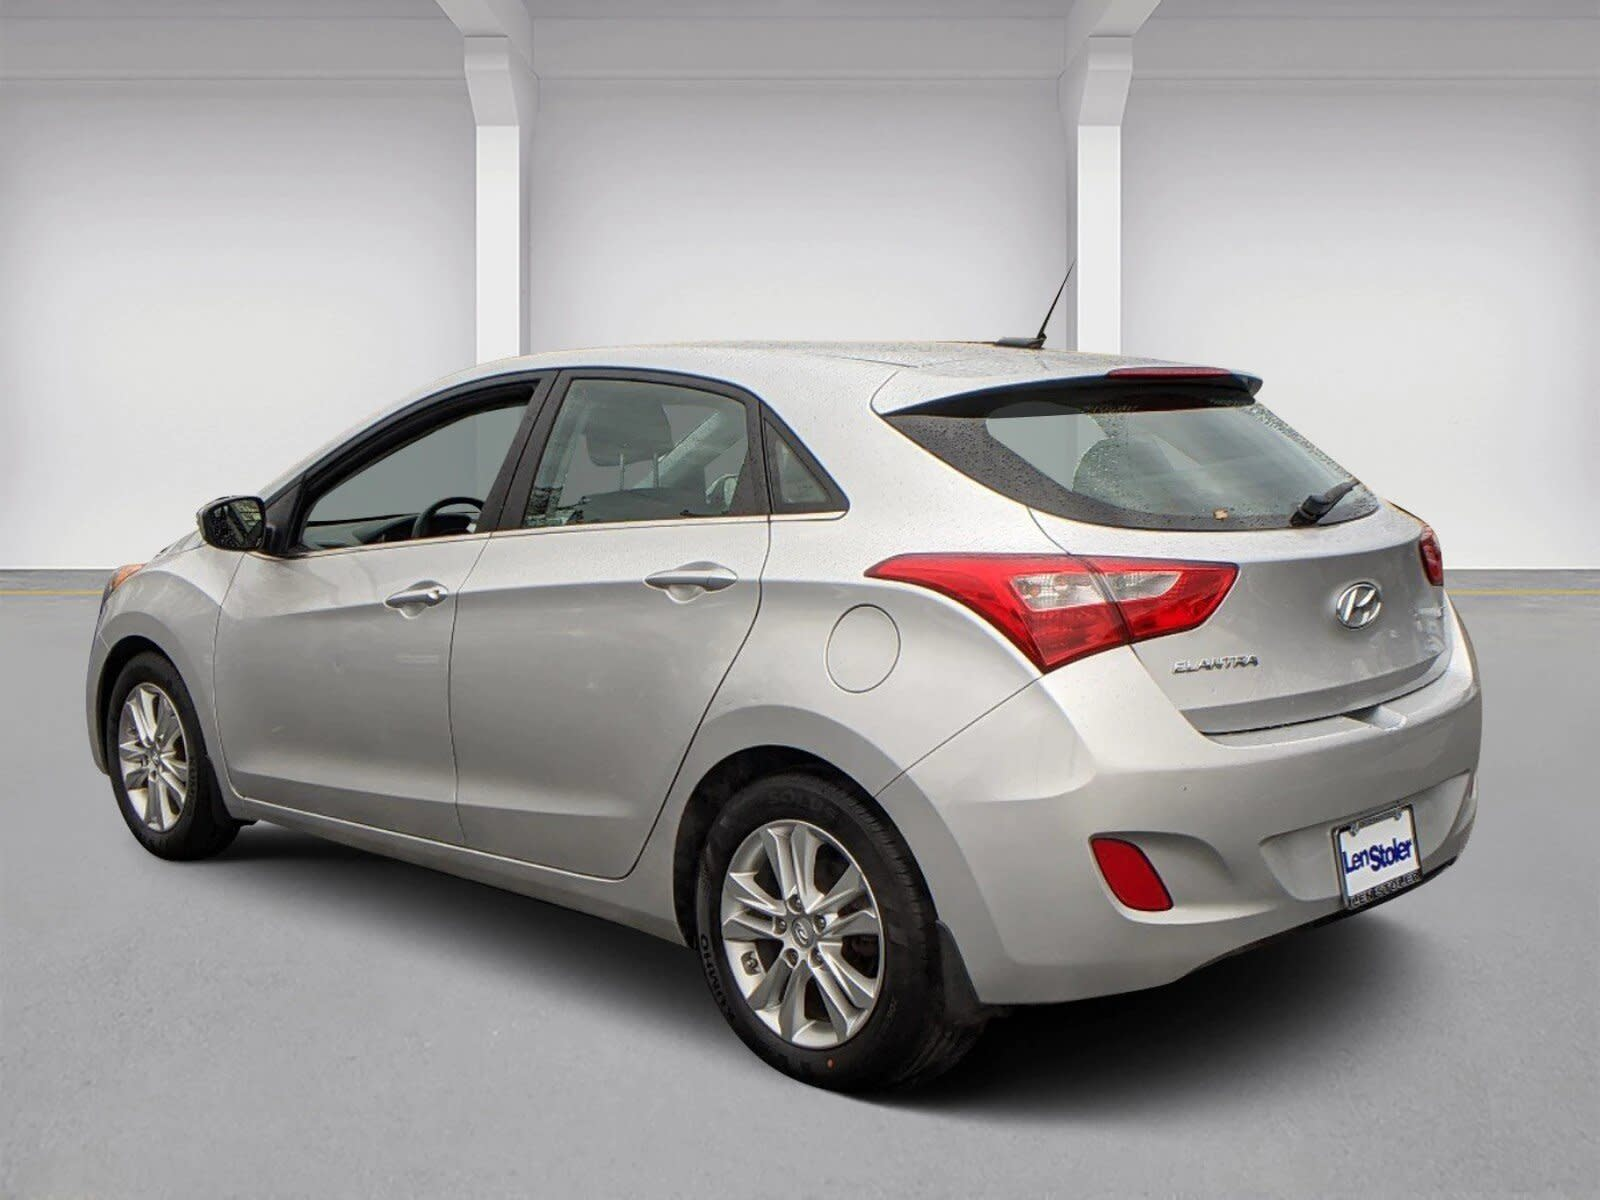 Hyundai Elantra GT Base Hatchback